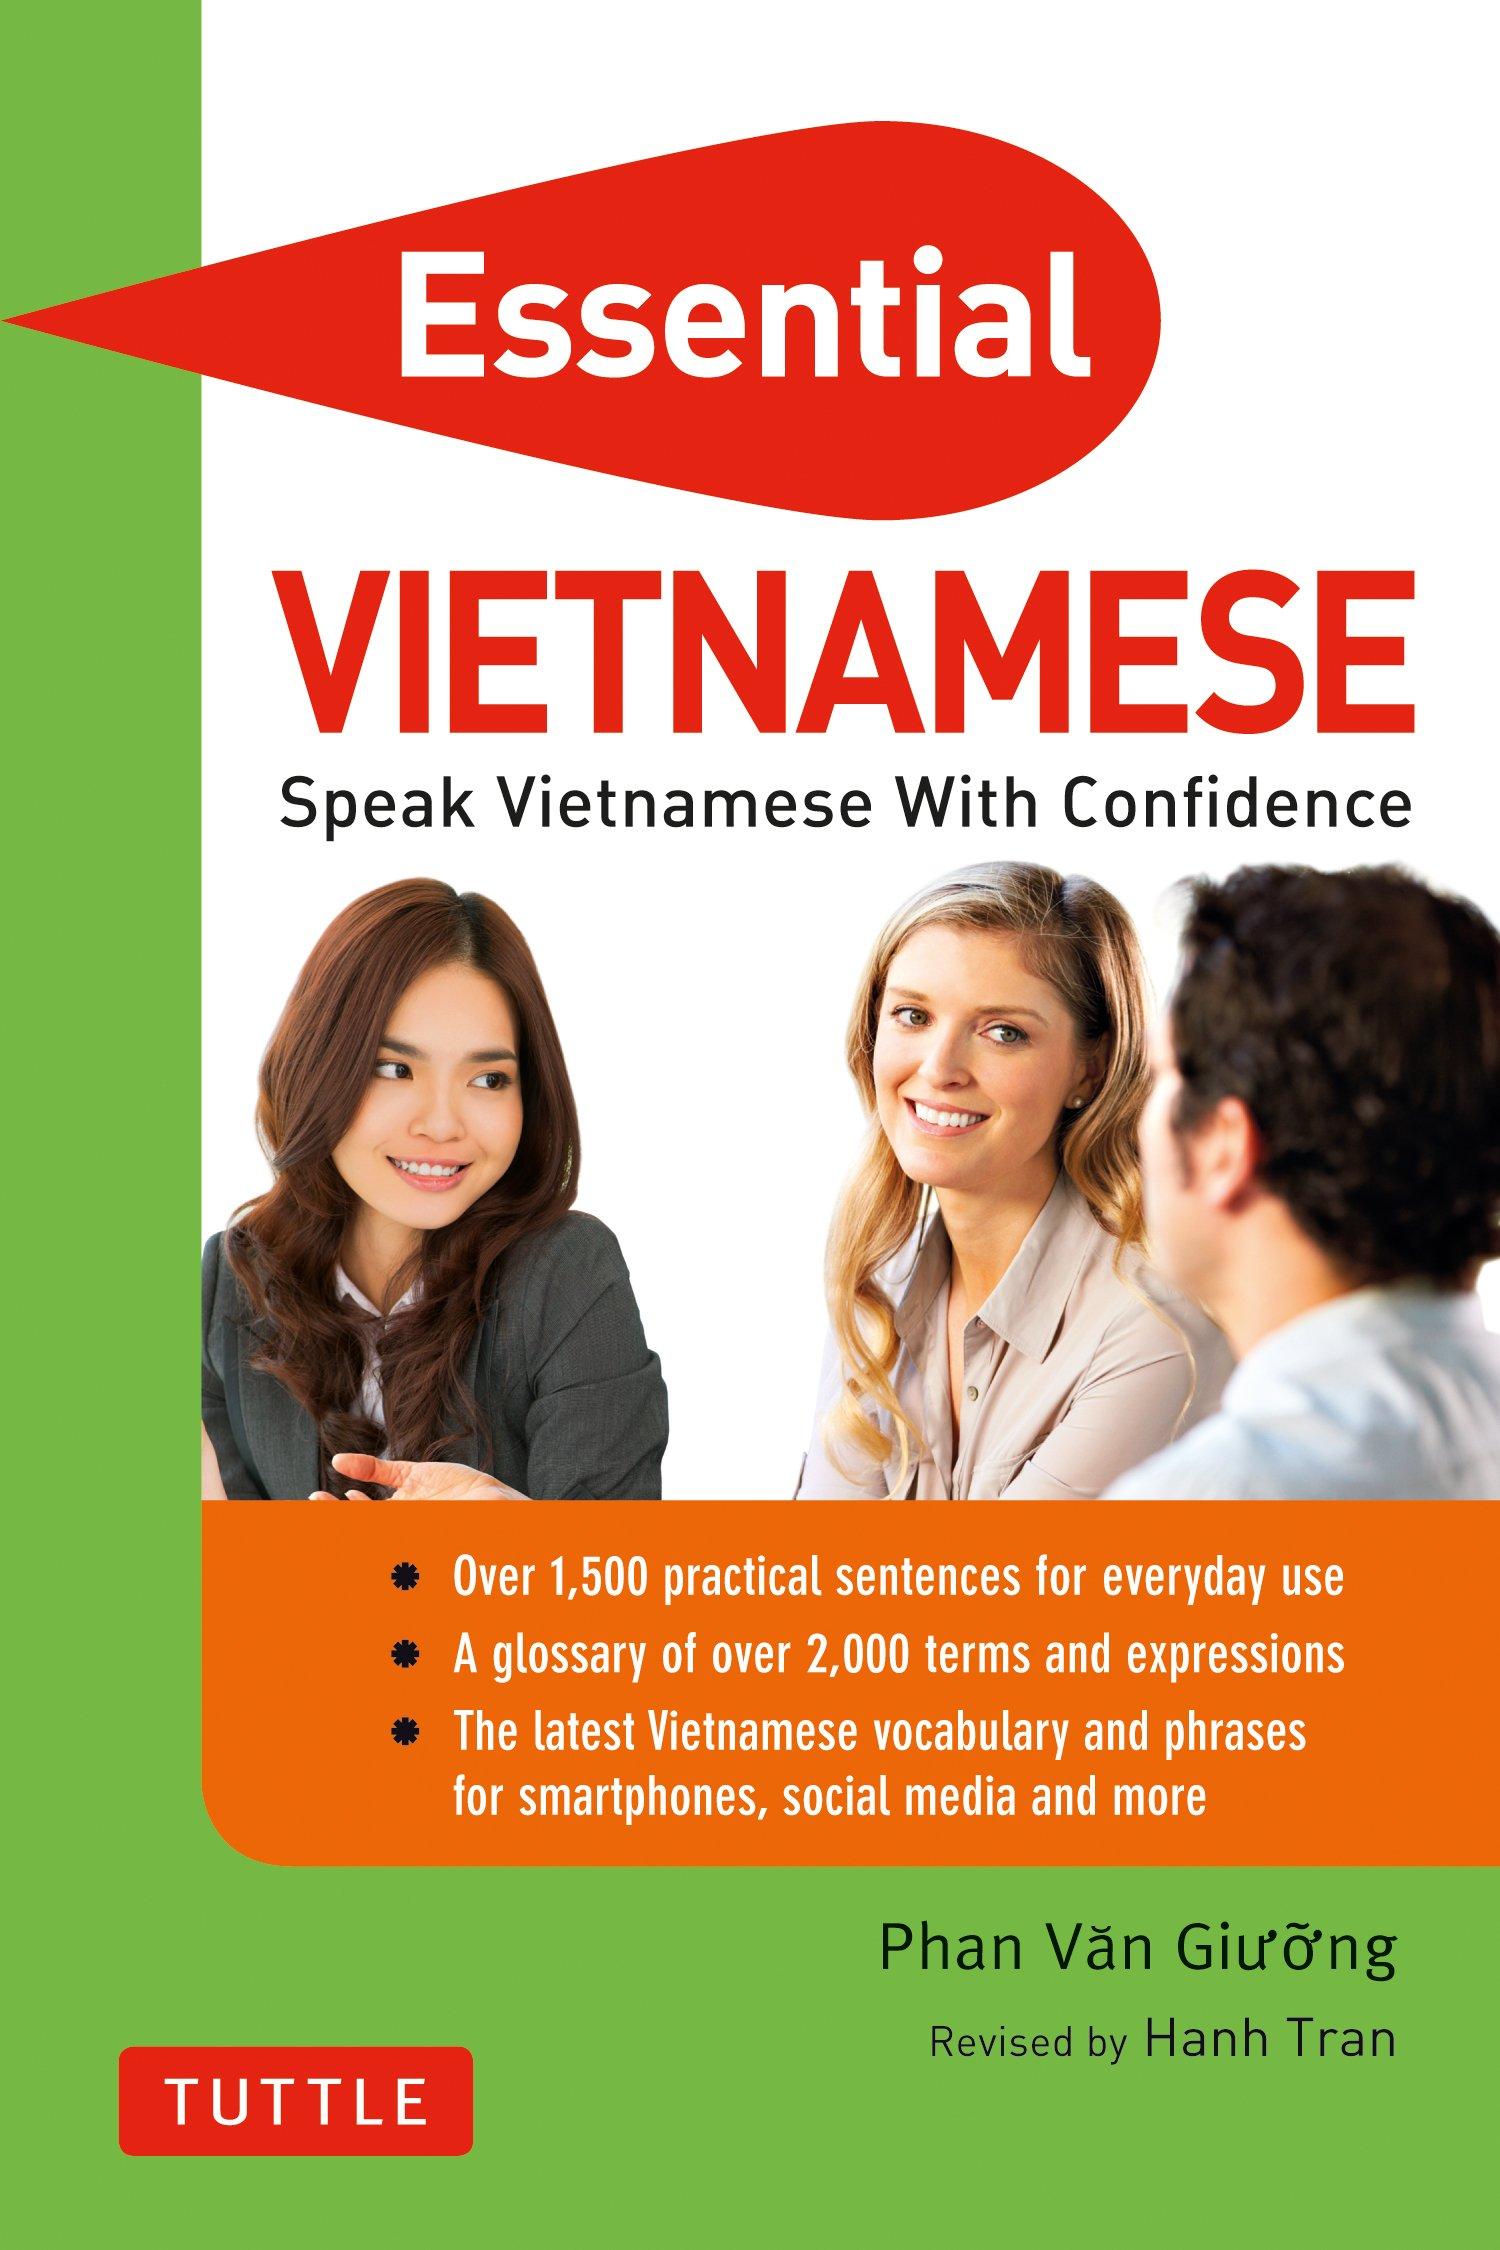 Download Essential Vietnamese: Speak Vietnamese with Confidence! (Vietnamese Phrasebook & Dictionary) (Essential Phrasebook & Disctionary Series) pdf